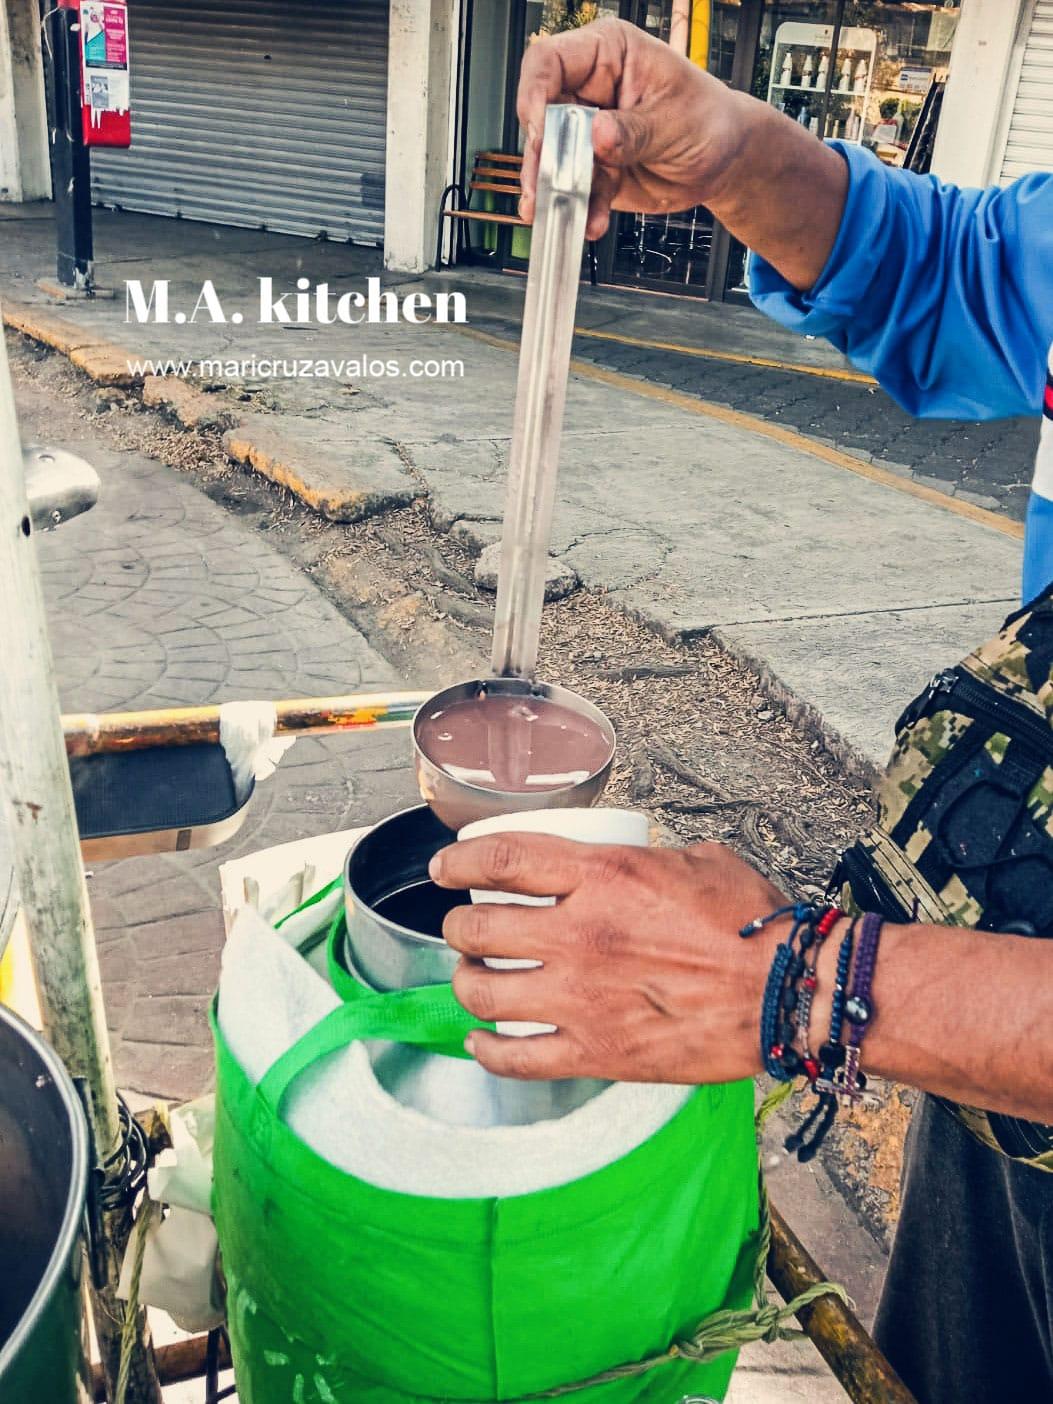 A man serving champurrado in a cup.